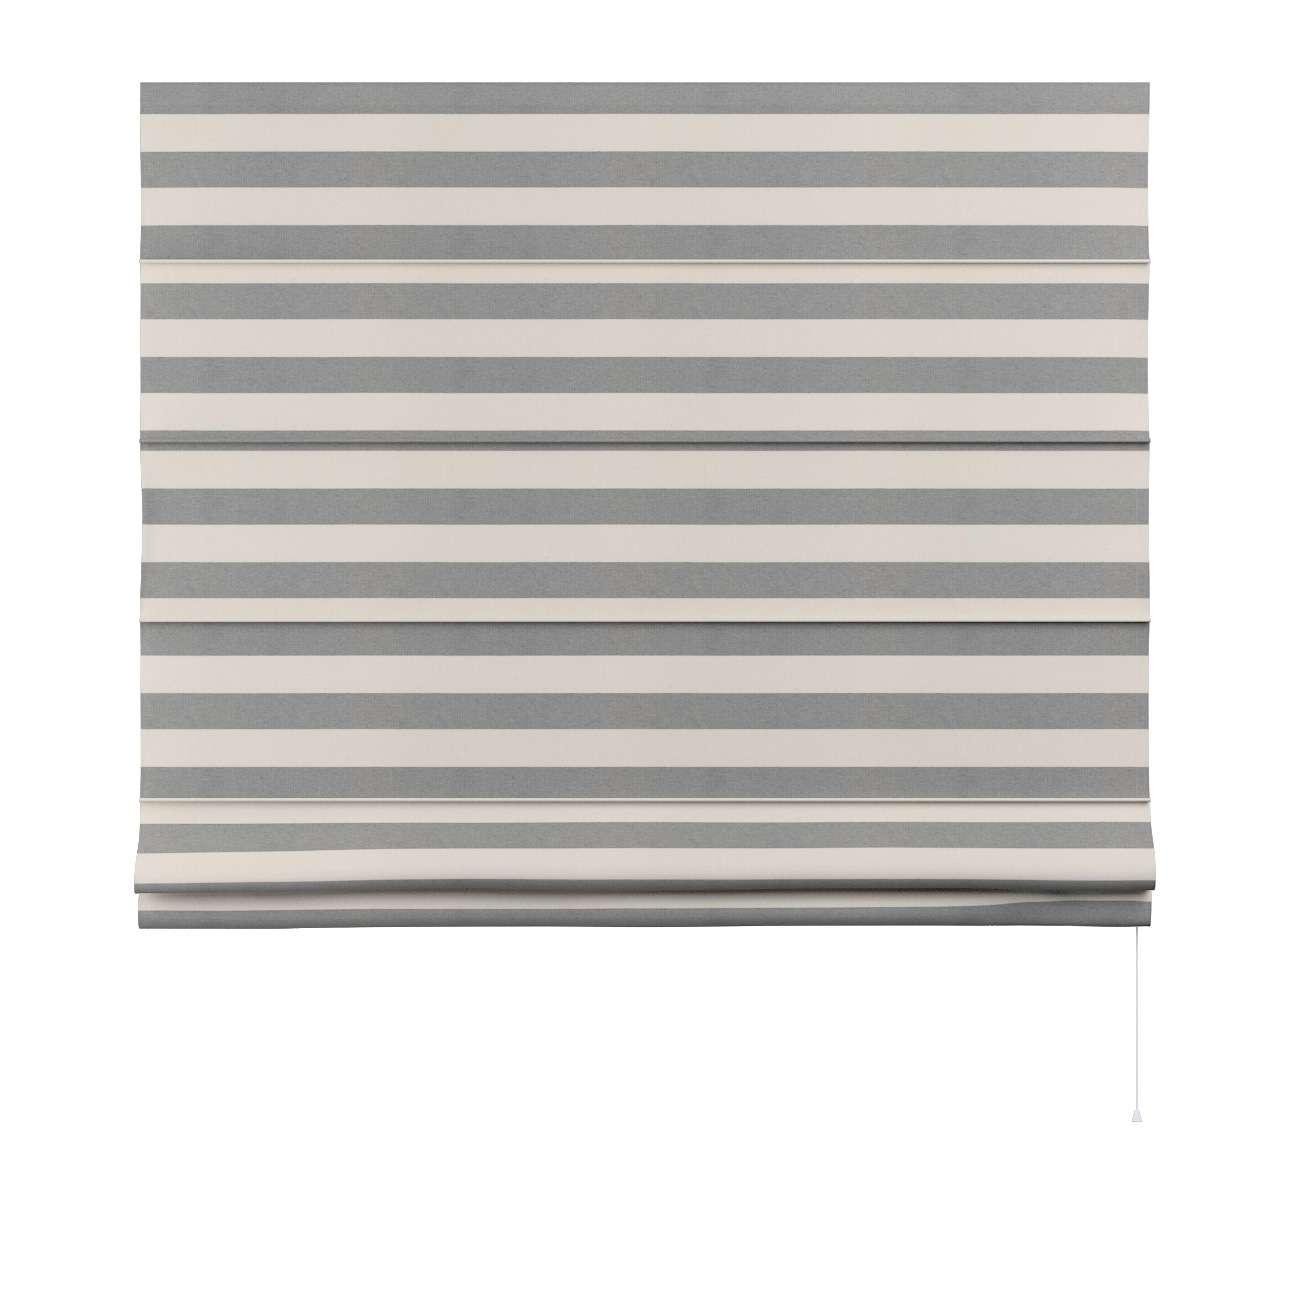 Roleta rzymska Capri w kolekcji Quadro, tkanina: 142-71